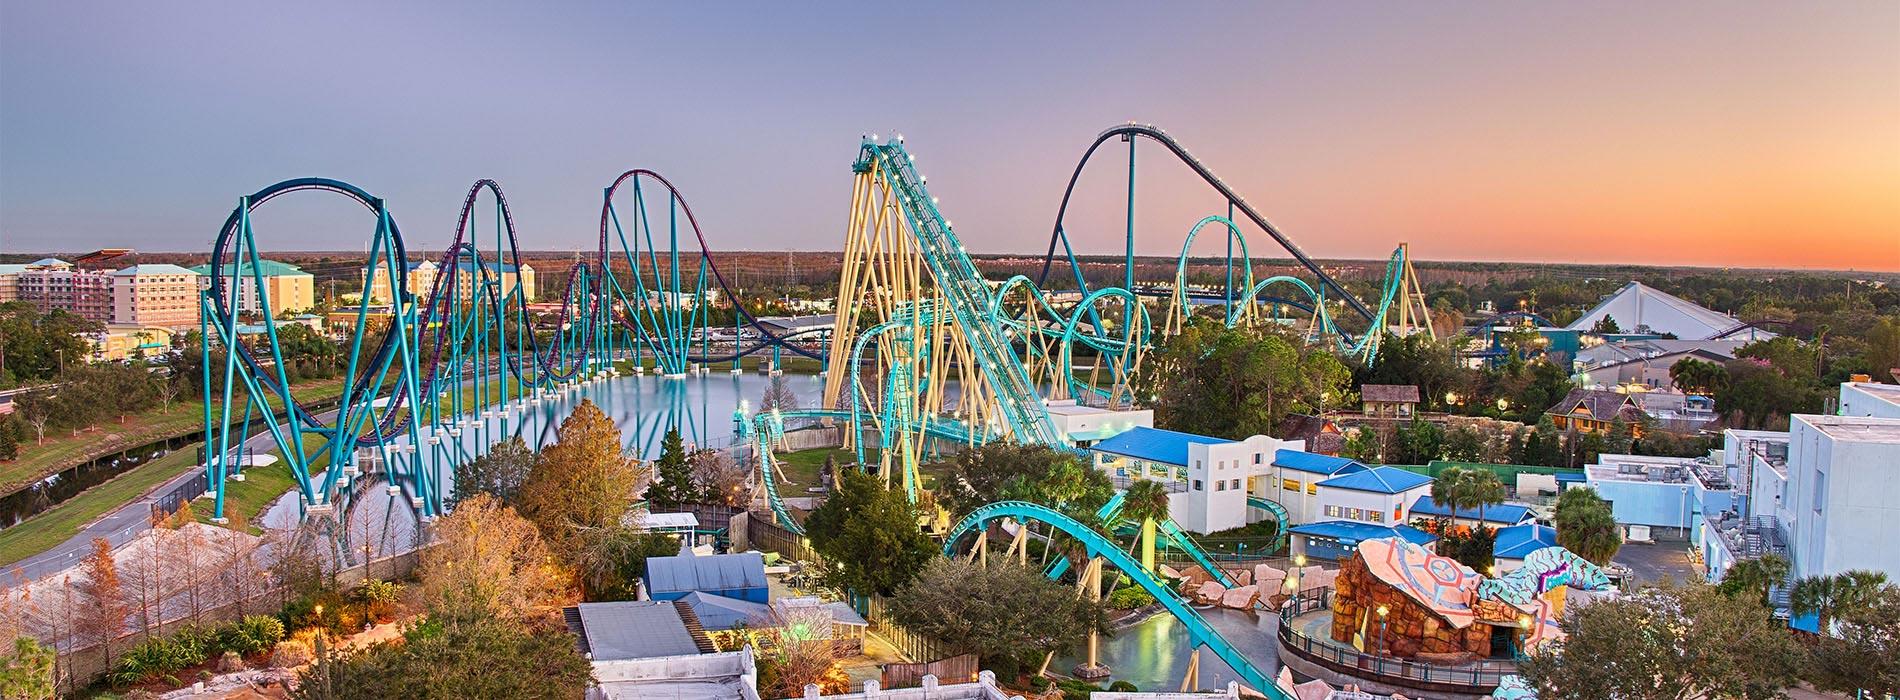 Aerial view of Mako and Kraken at SeaWorld Orlando